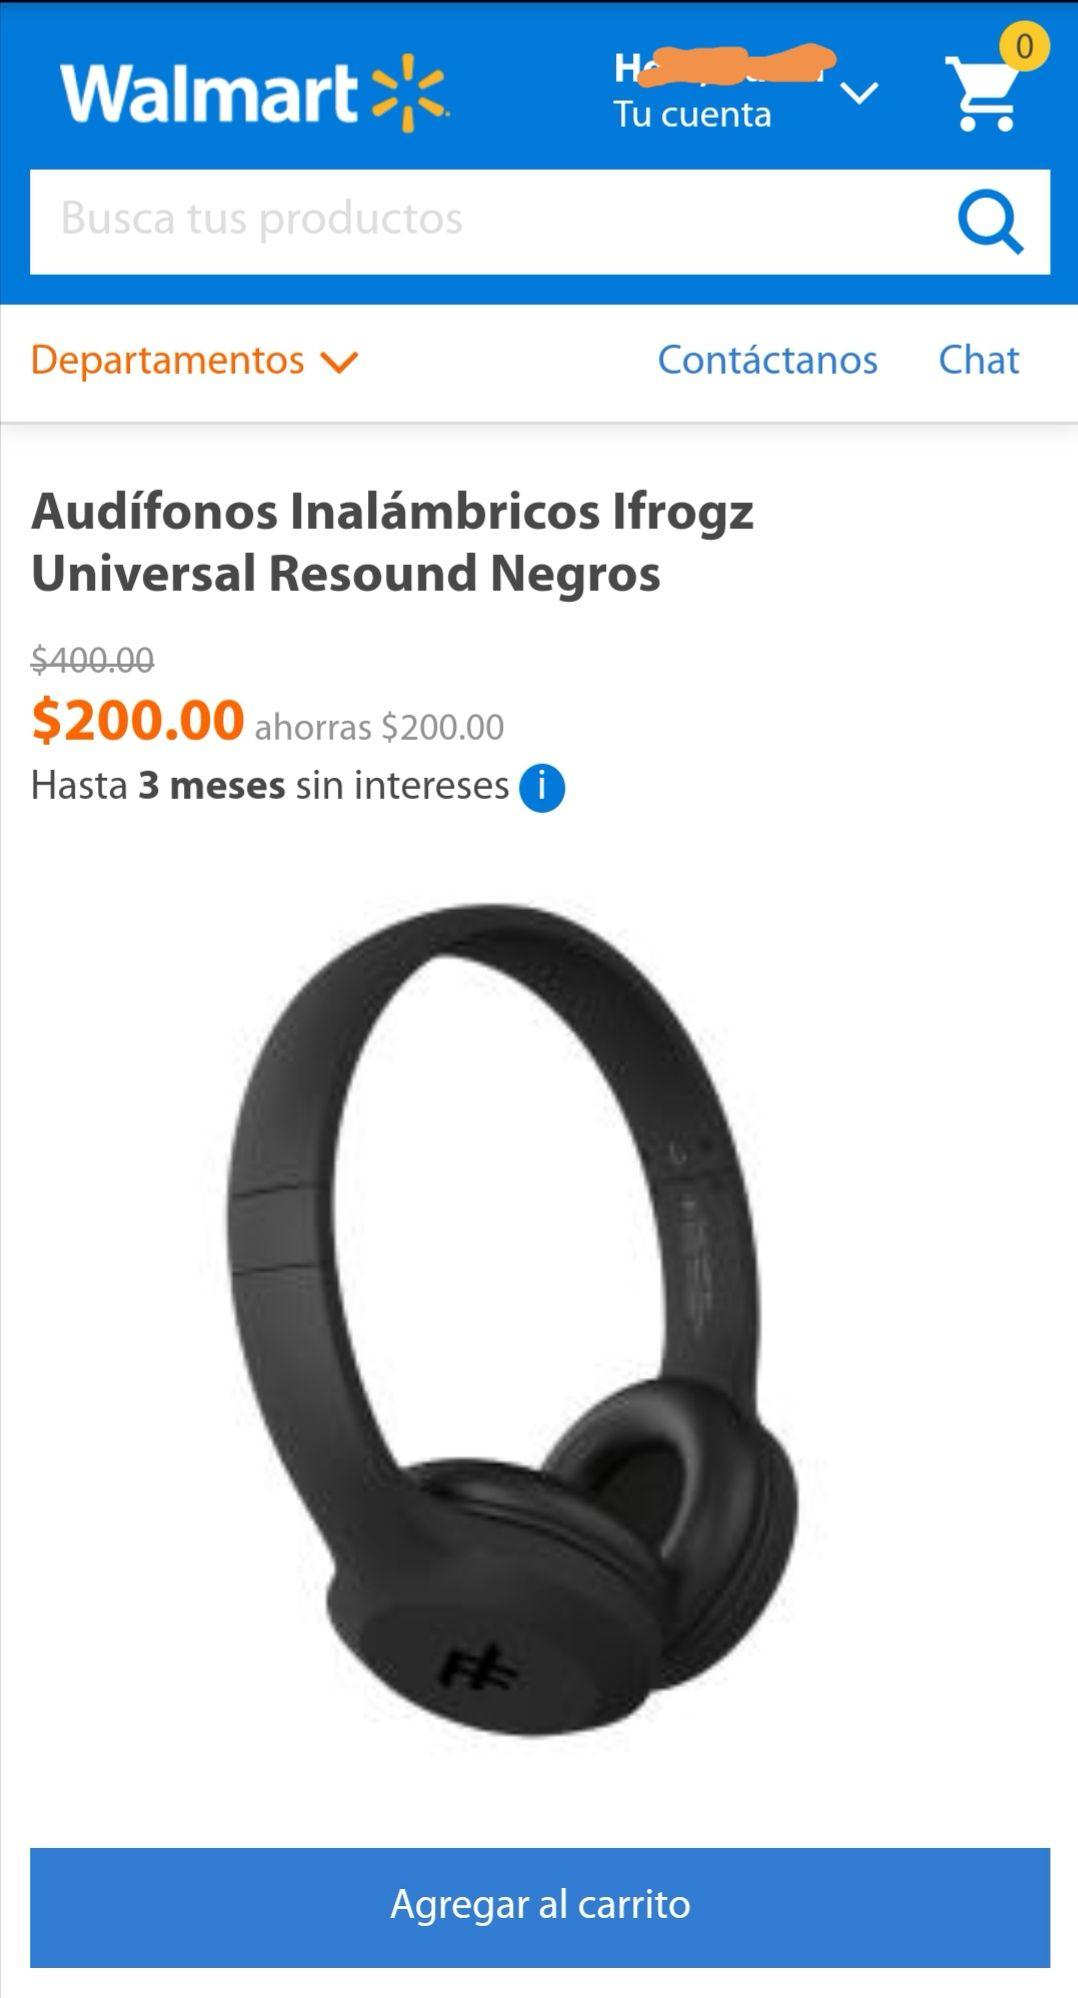 Walmart: Audífonos Inalámbricos Ifrogz Universal Resound Negros